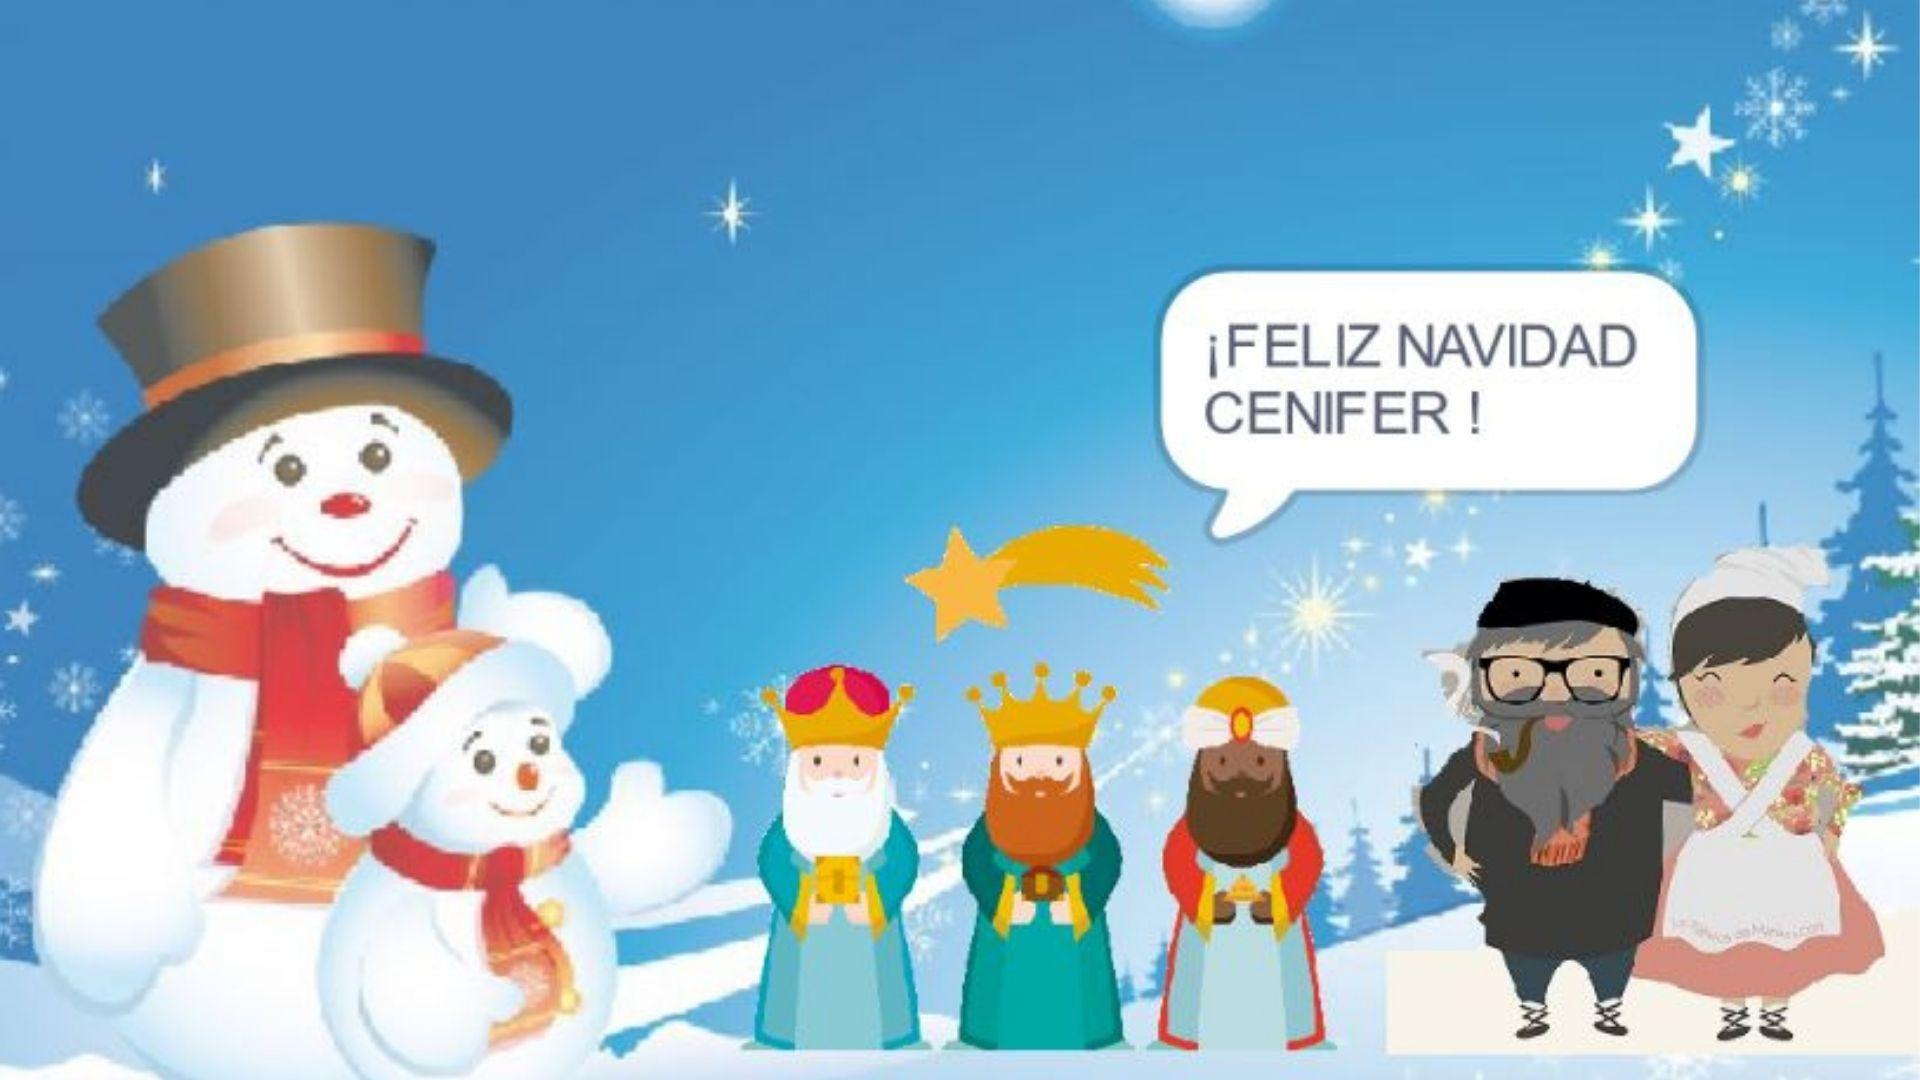 Cenifer Feliz Navidad 2020